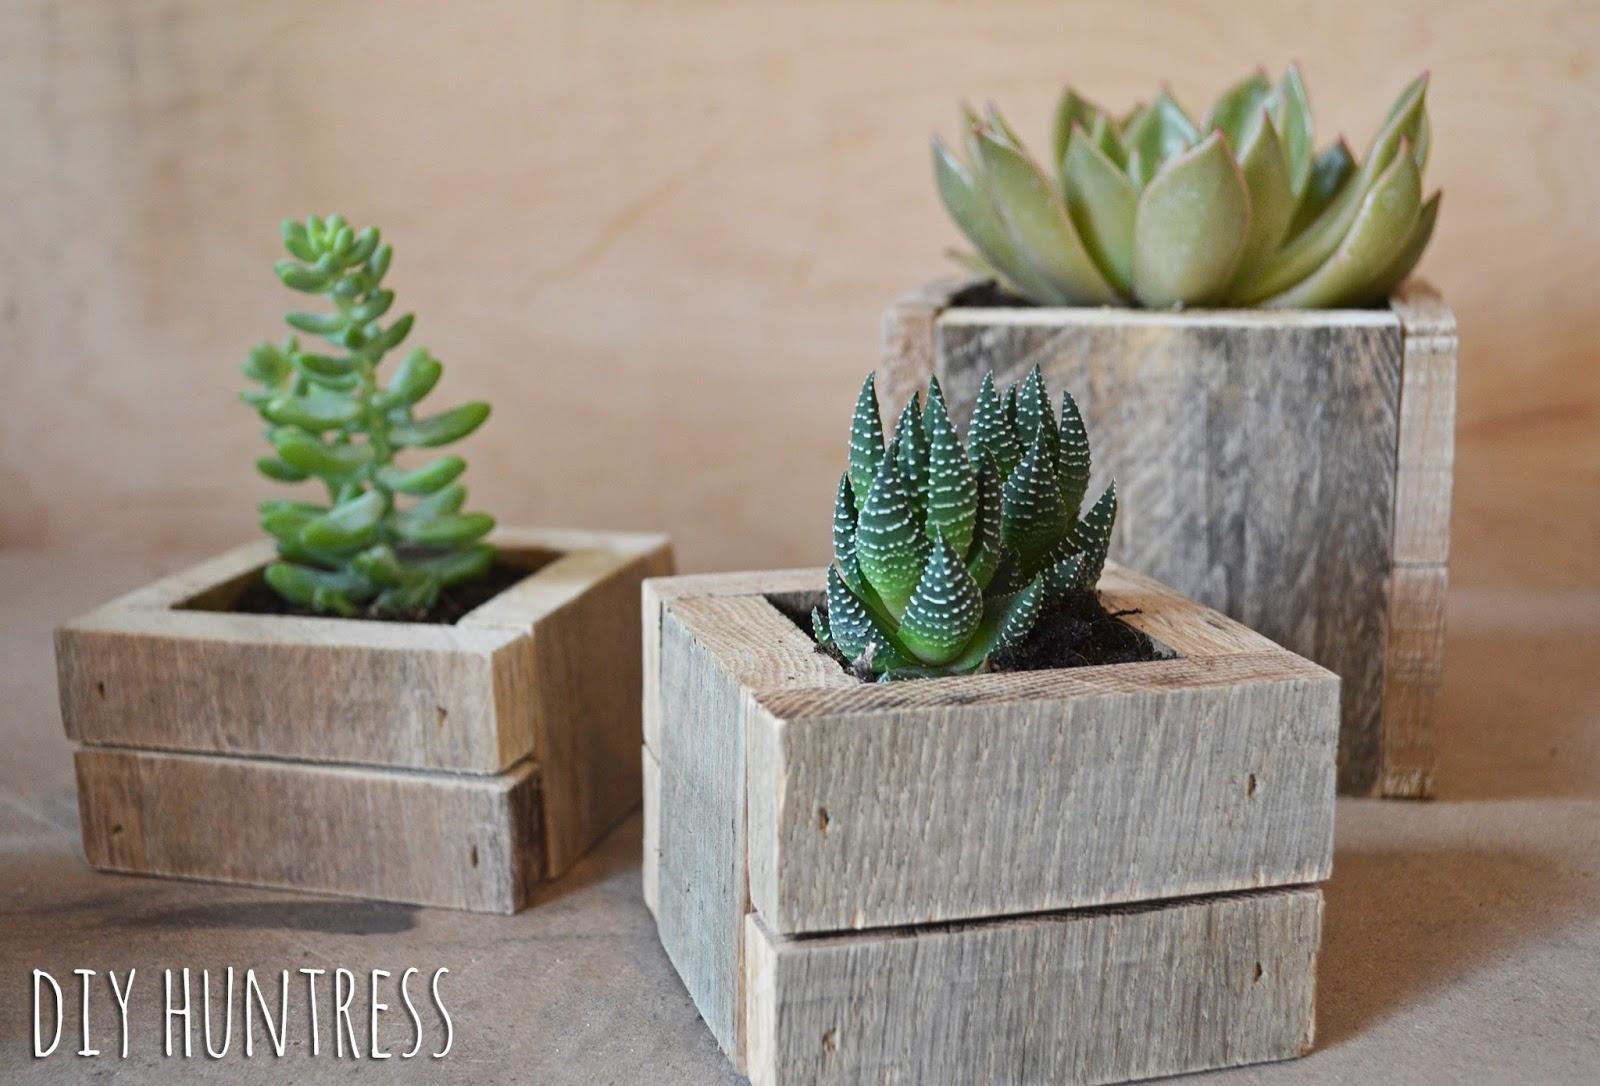 Diy pallet wood succulent planters diy huntress for Wooden cactus planter